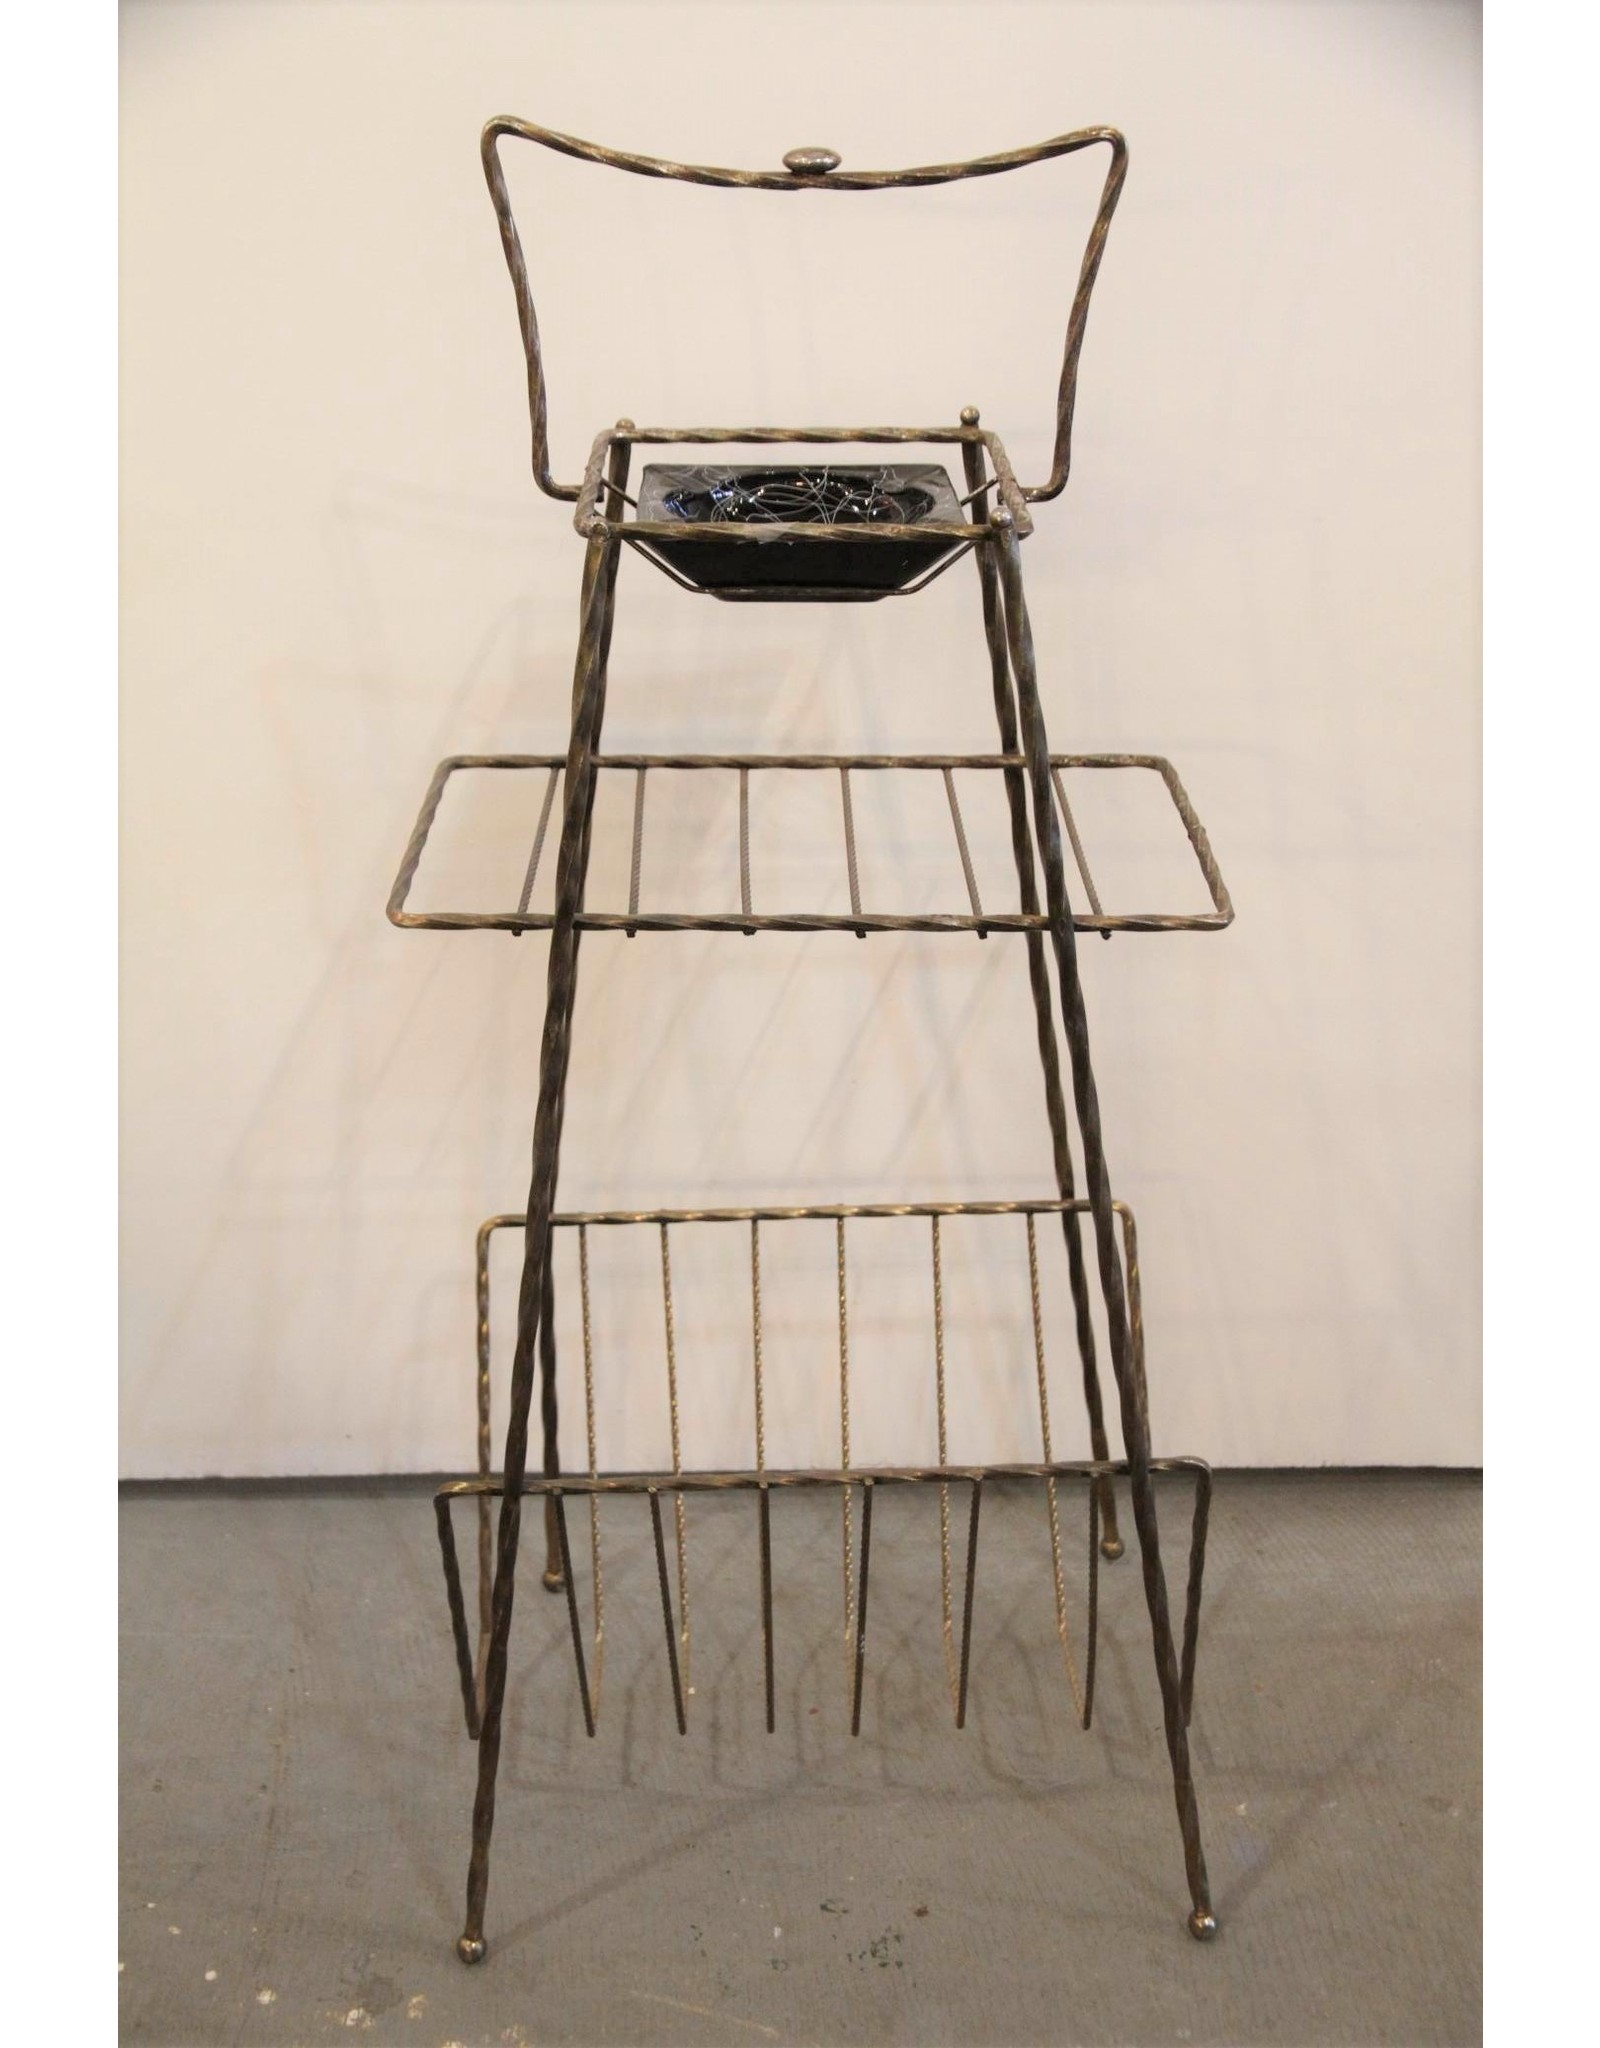 Ashtray stand - brass coloured wire, magazine rack, glass ashtray